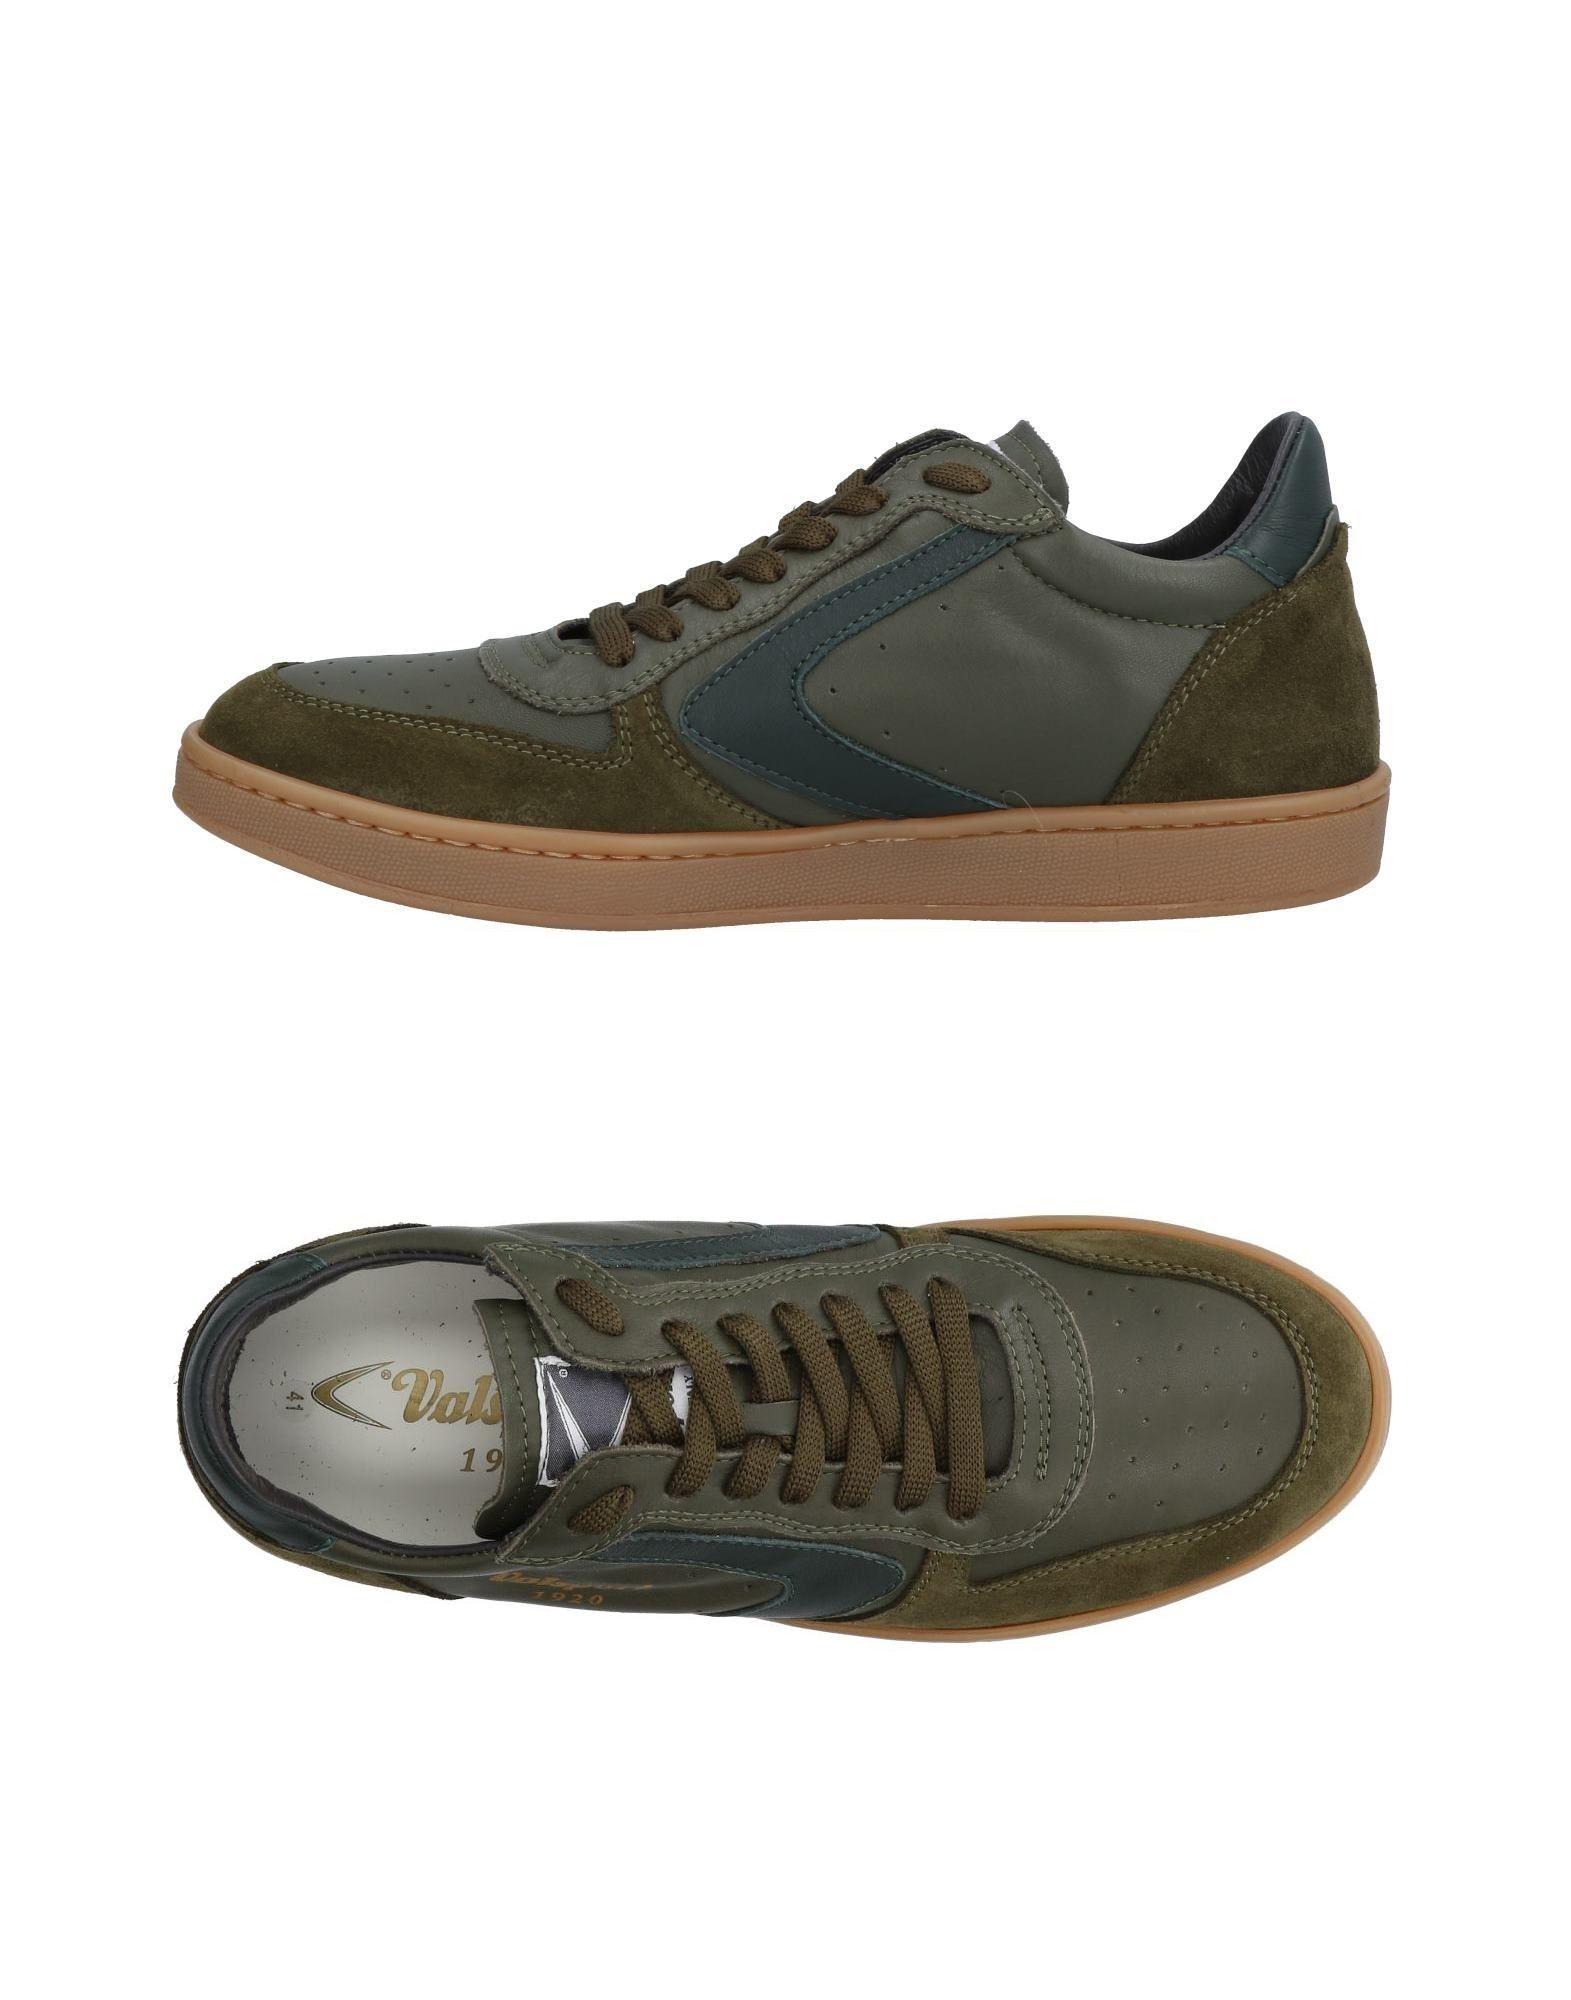 Valsport Sneakers Herren  11471035EU Gute Qualität beliebte Schuhe